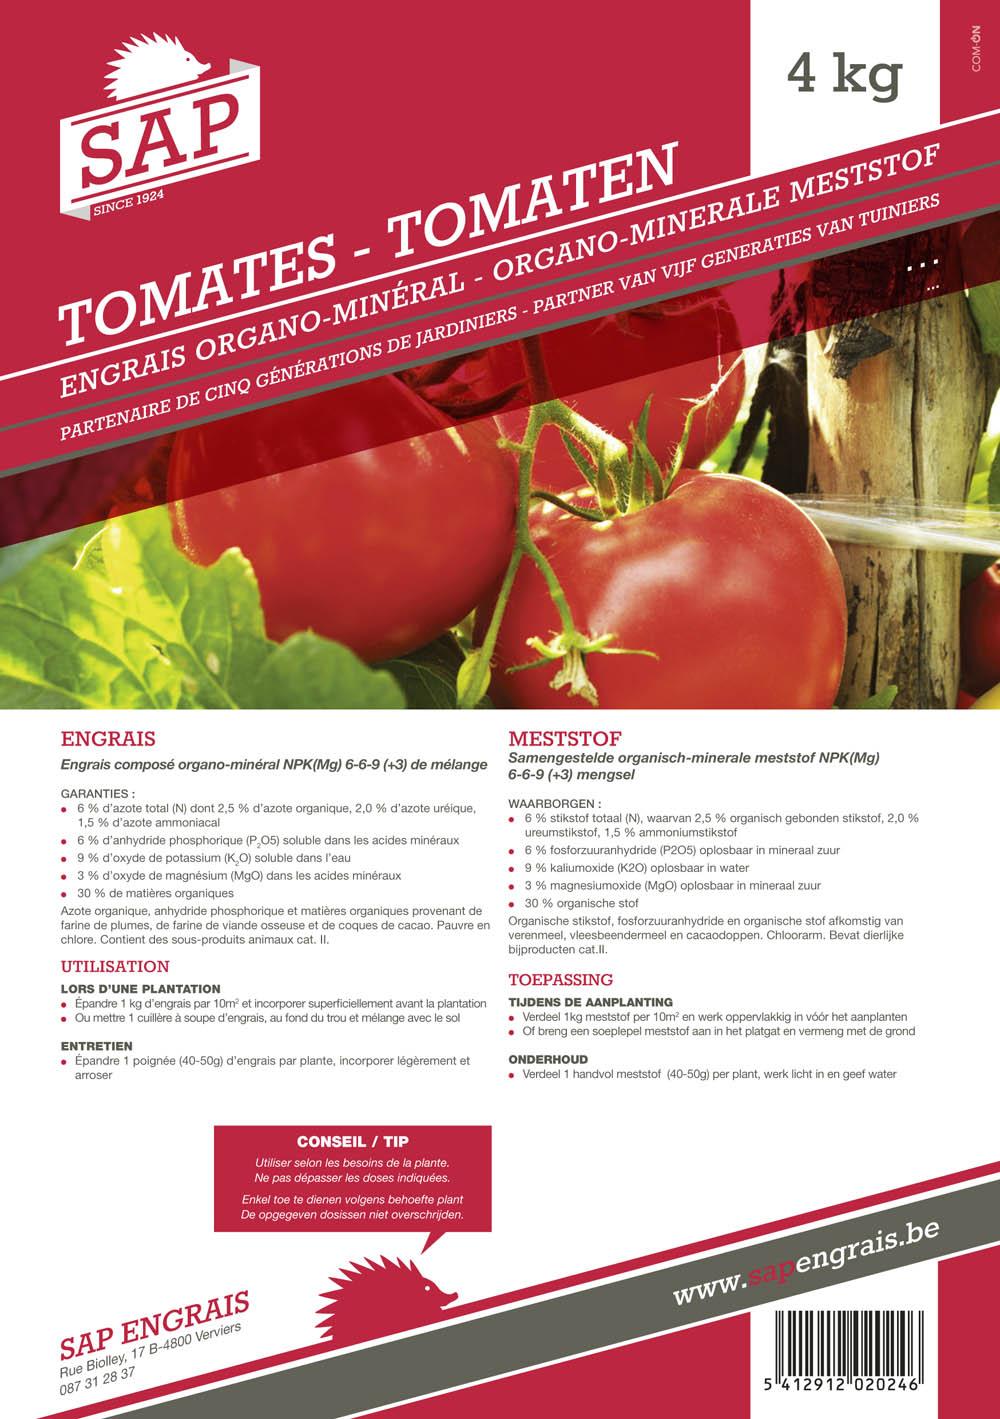 Engrais SAP Tomates 4kg